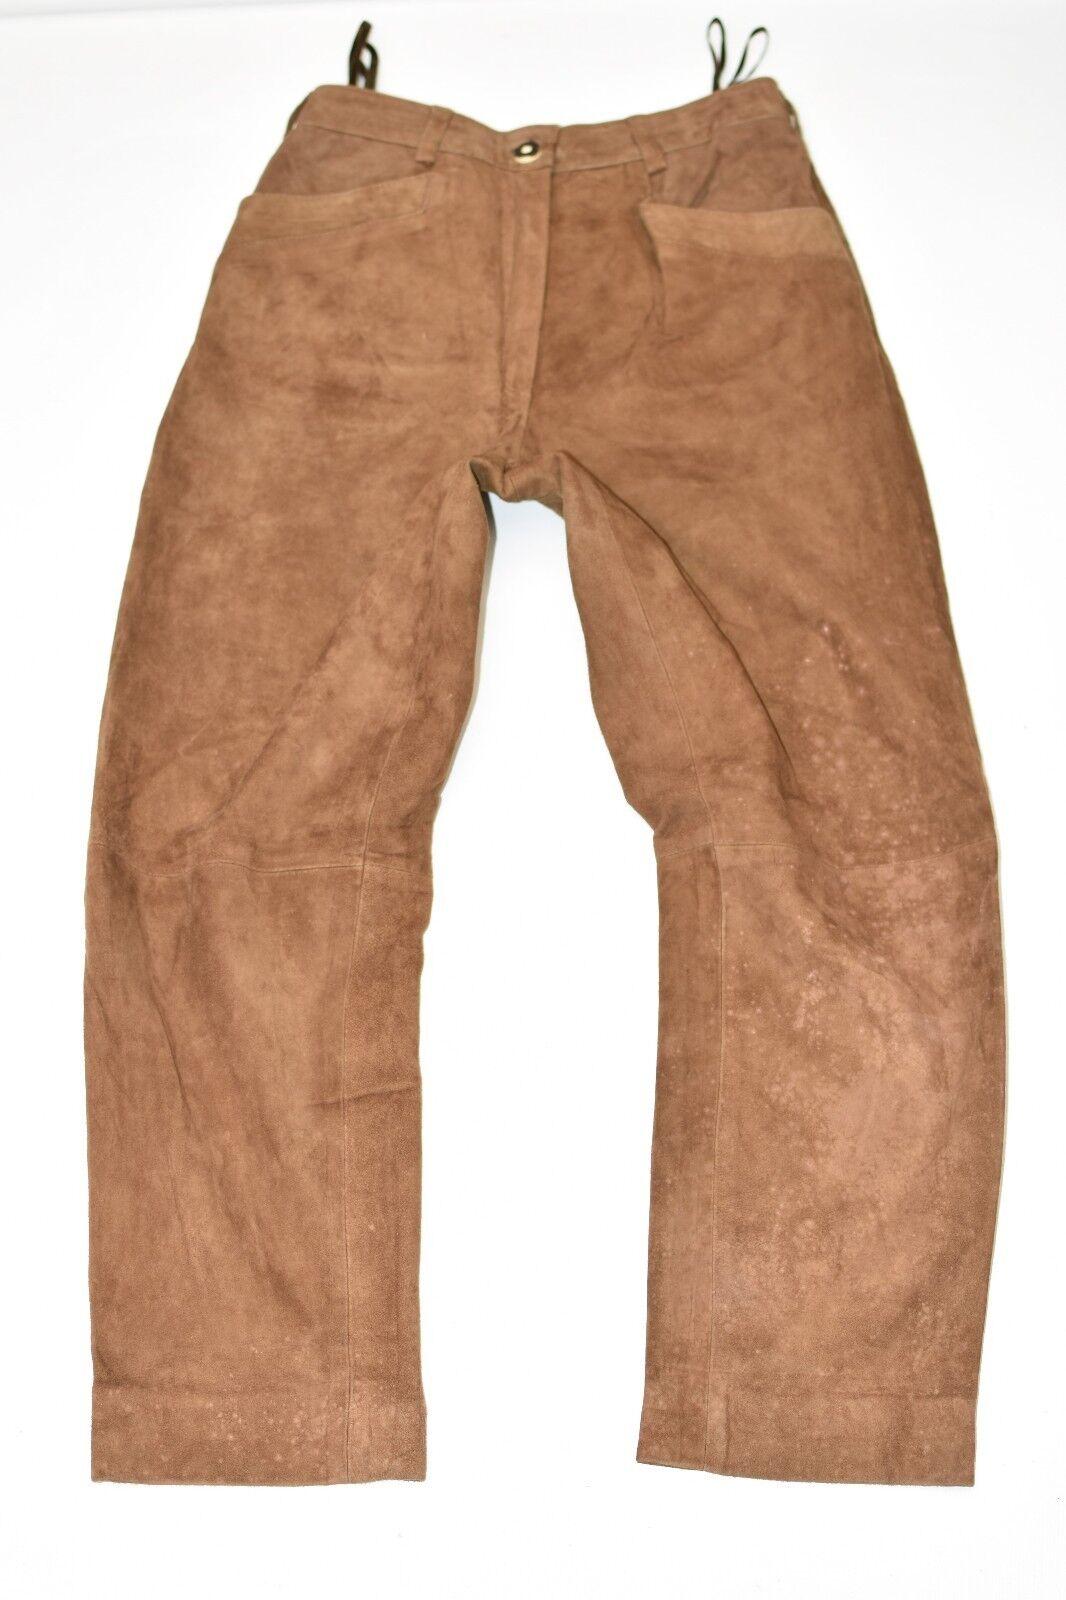 Vintage Brown Leather GUNDI Straight Biker Women's Trousers Pants Size W29  L27